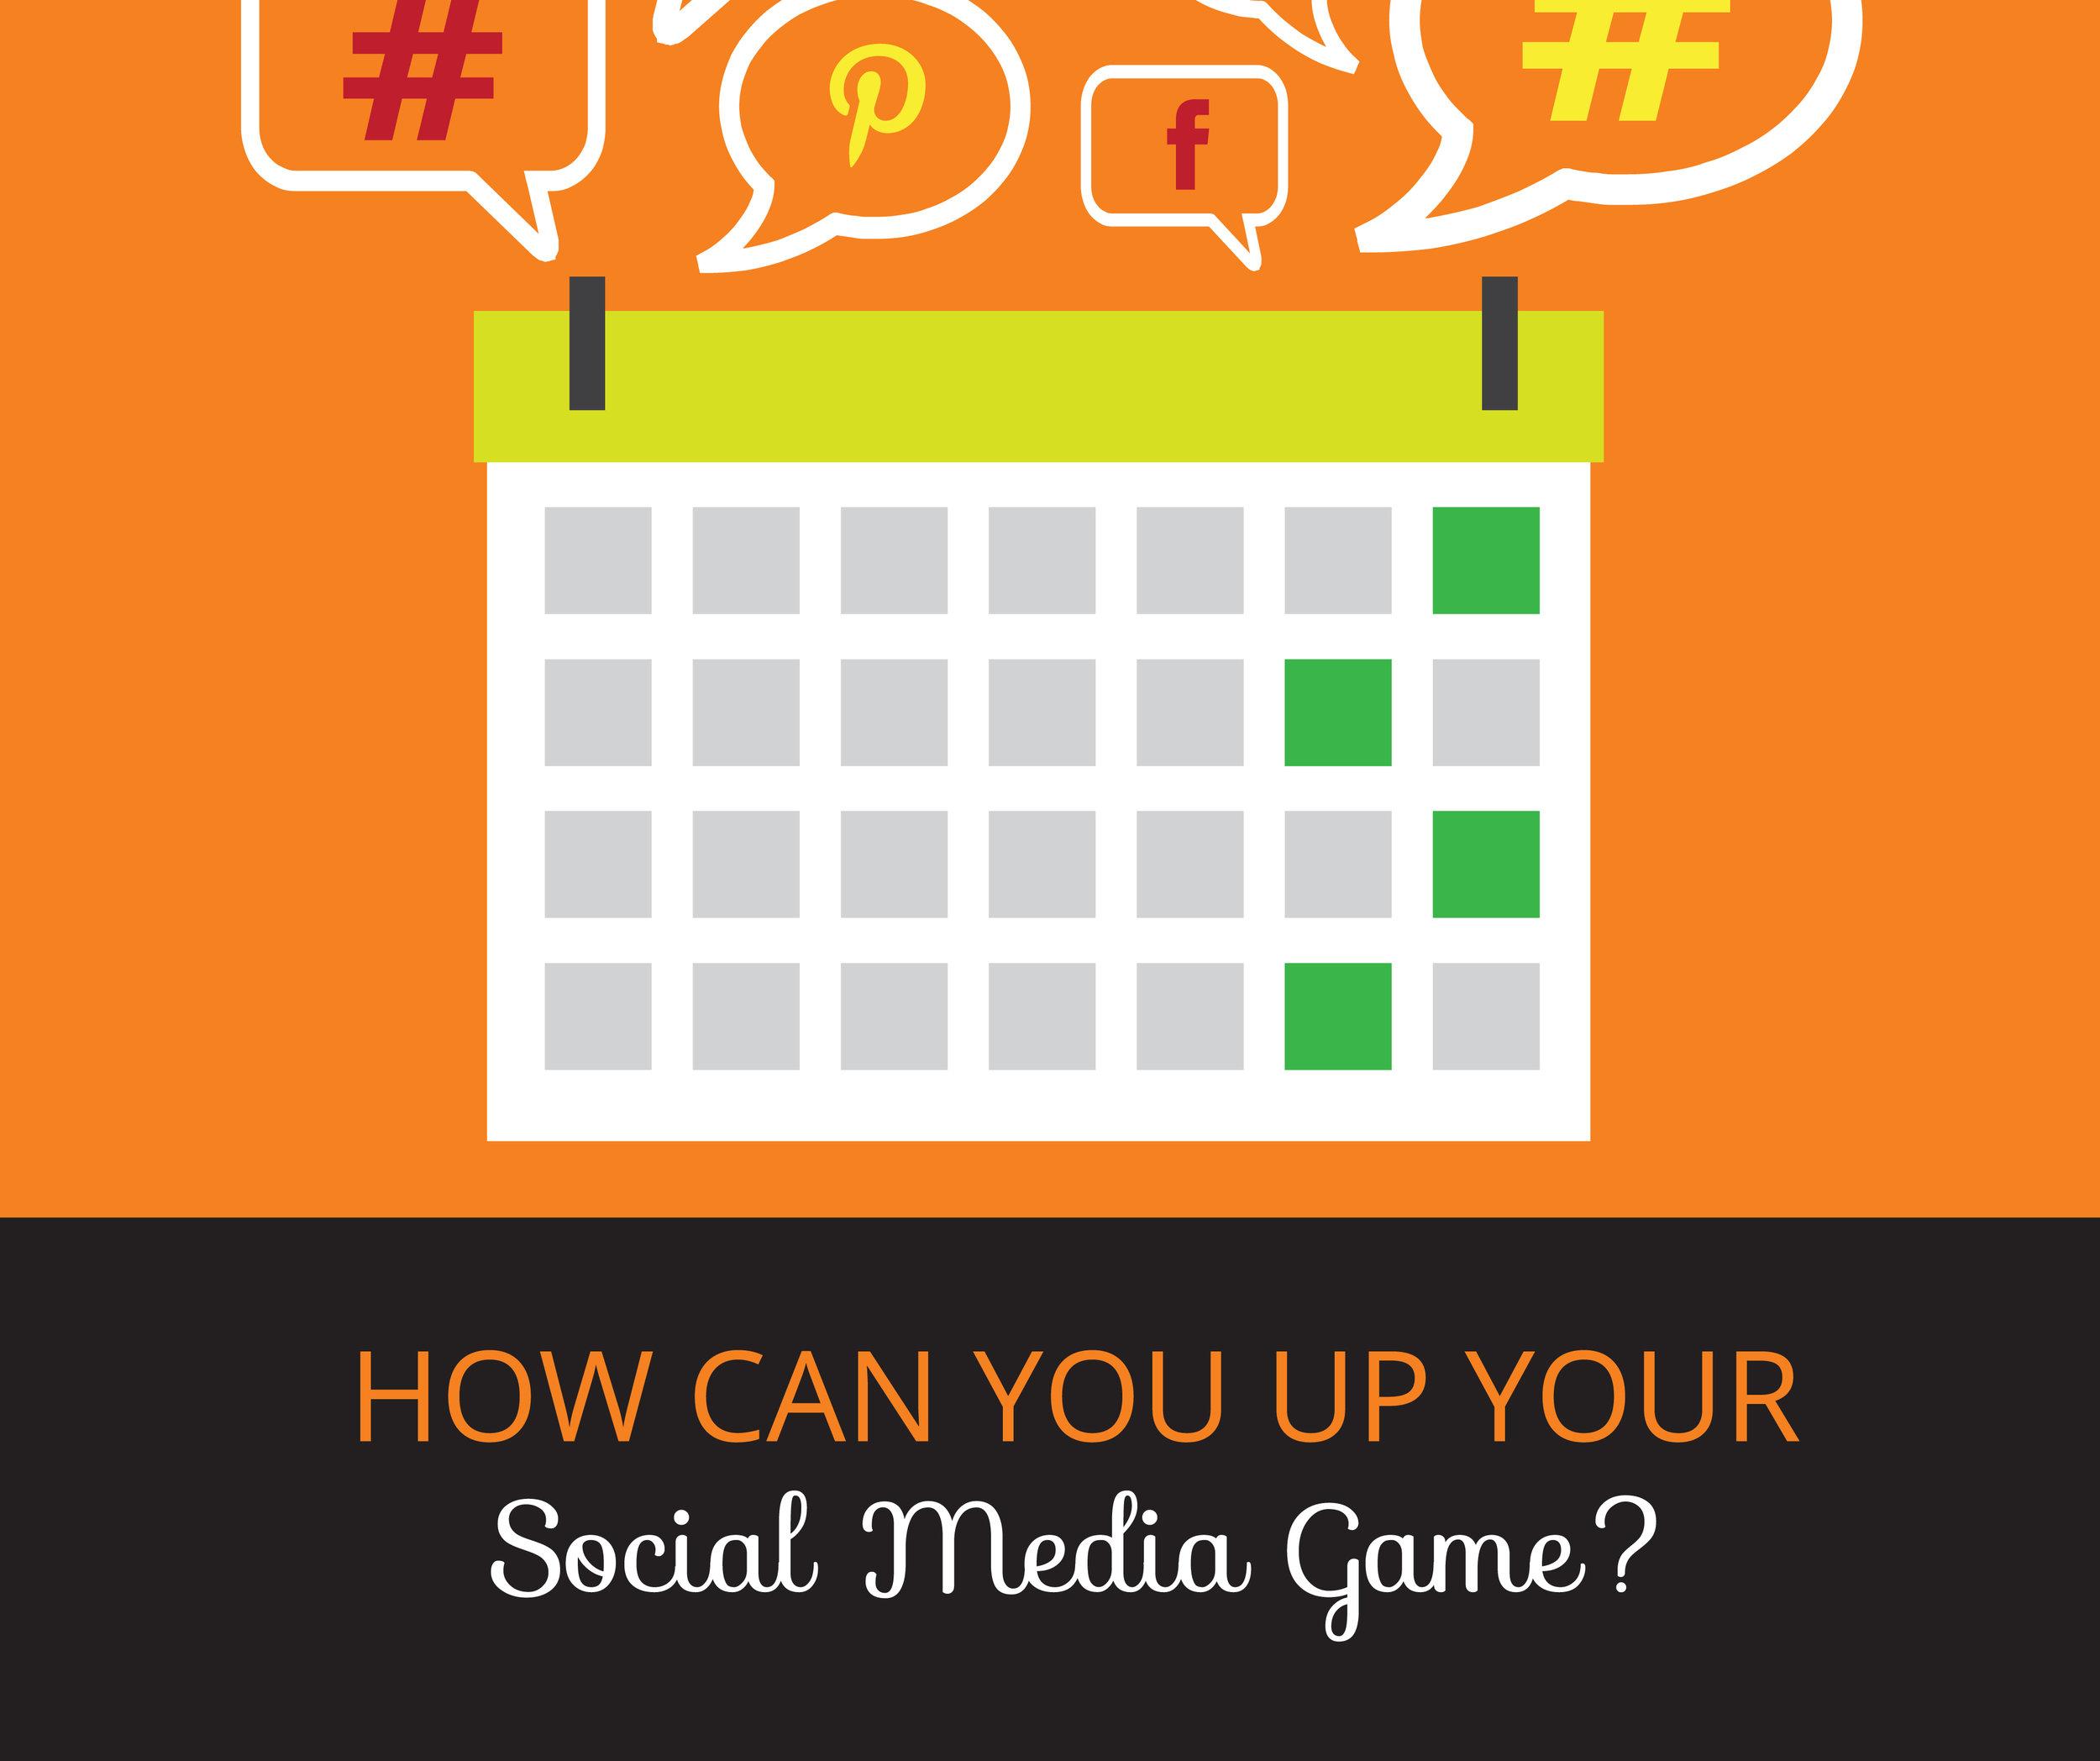 Increase engagement & activity on Social Media. Small business social media tips.